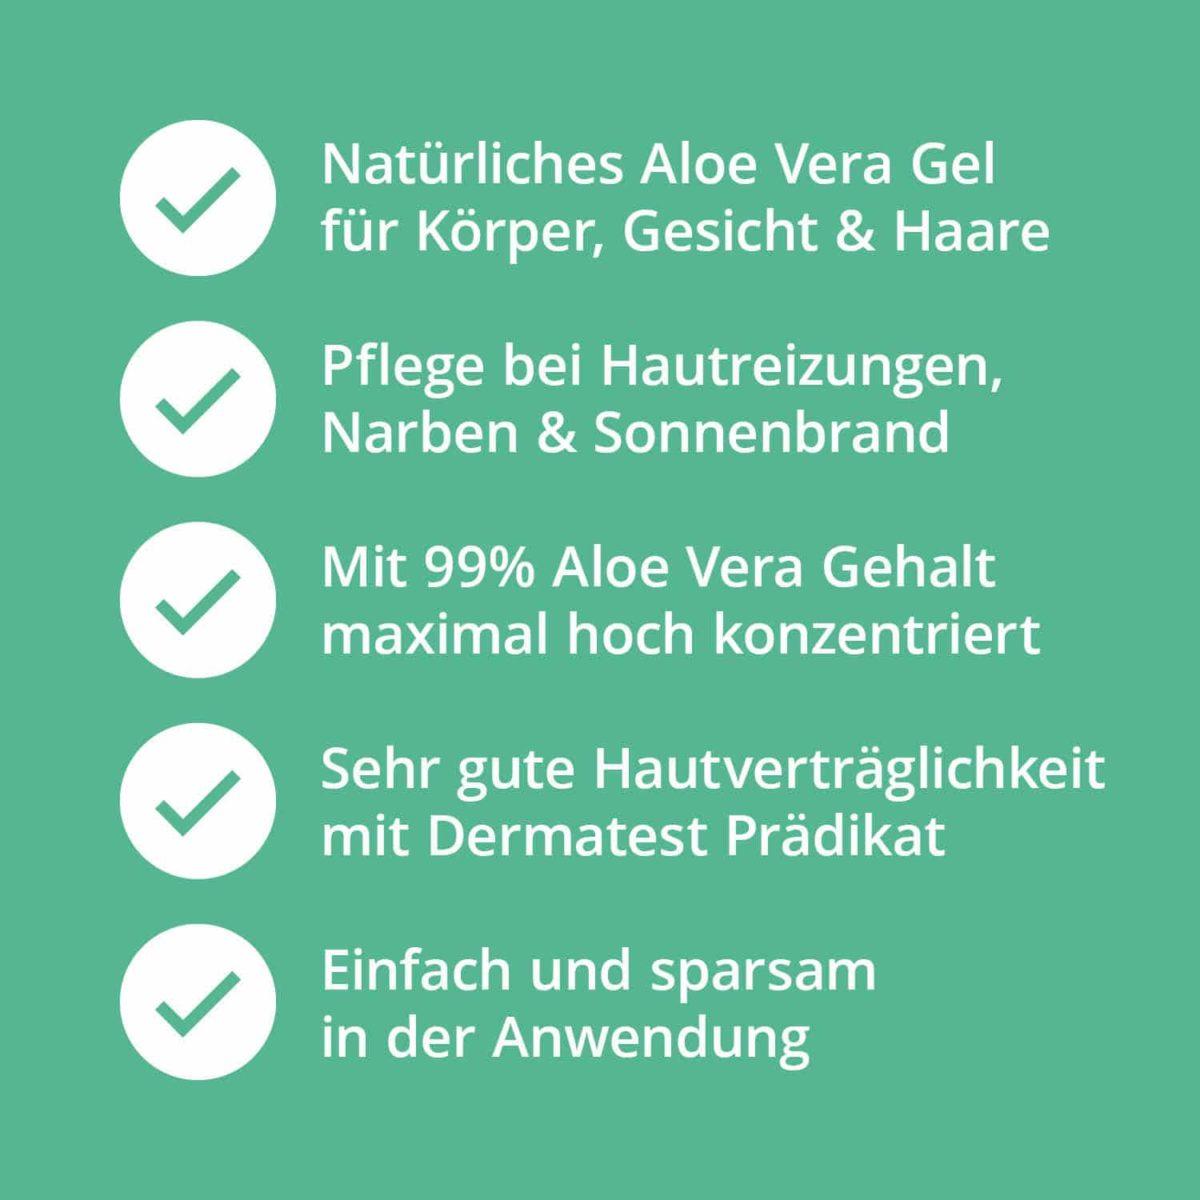 Casida Aloe Vera Gel Haut & Haare 16573212 PZN Apotheke Hautpflege After Sun (7)